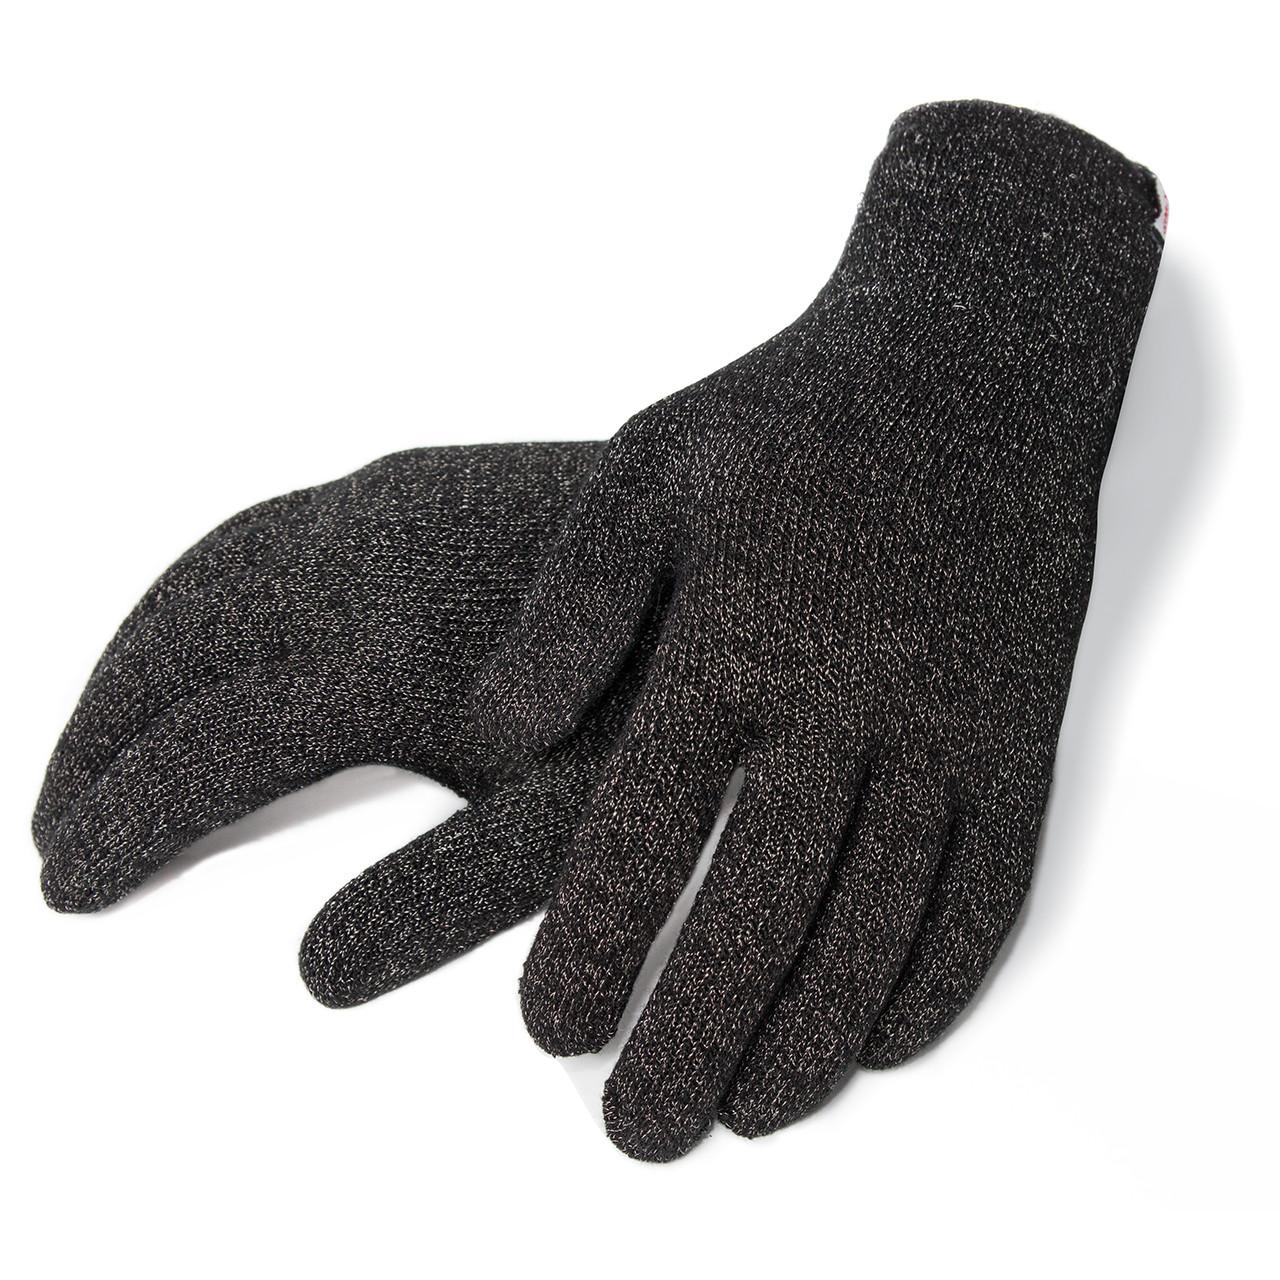 Agloves original lightweight glove